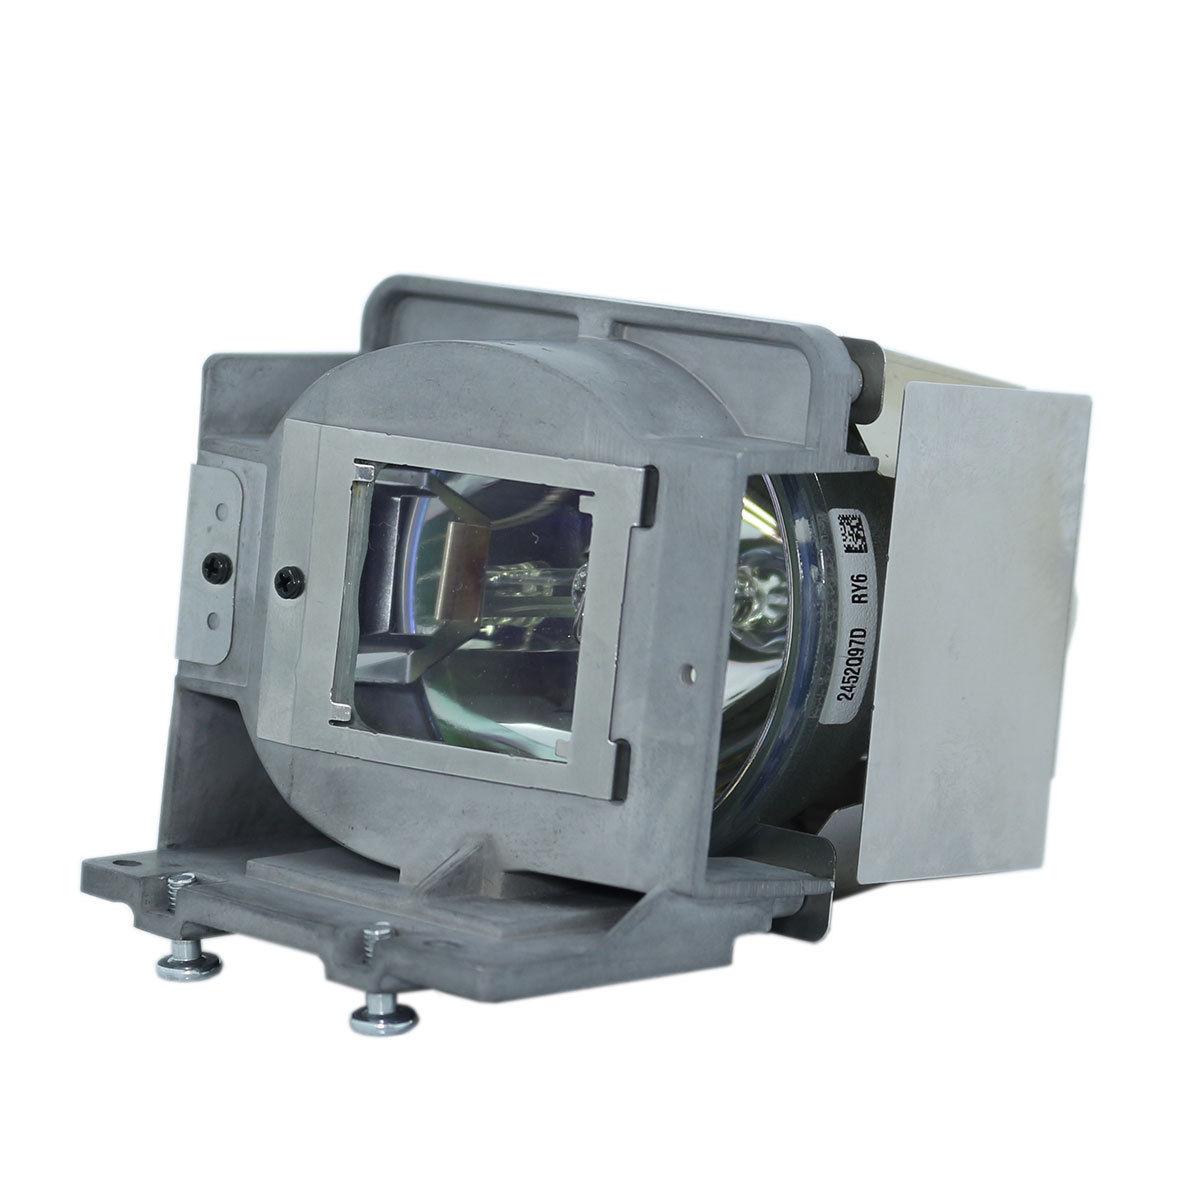 Projector Lamp Bulb RLC-080 RLC080 for VIEWSONIC PJD8333S PJD8633WS with housing projector lamp bulb rlc 013 rlc013 lamp